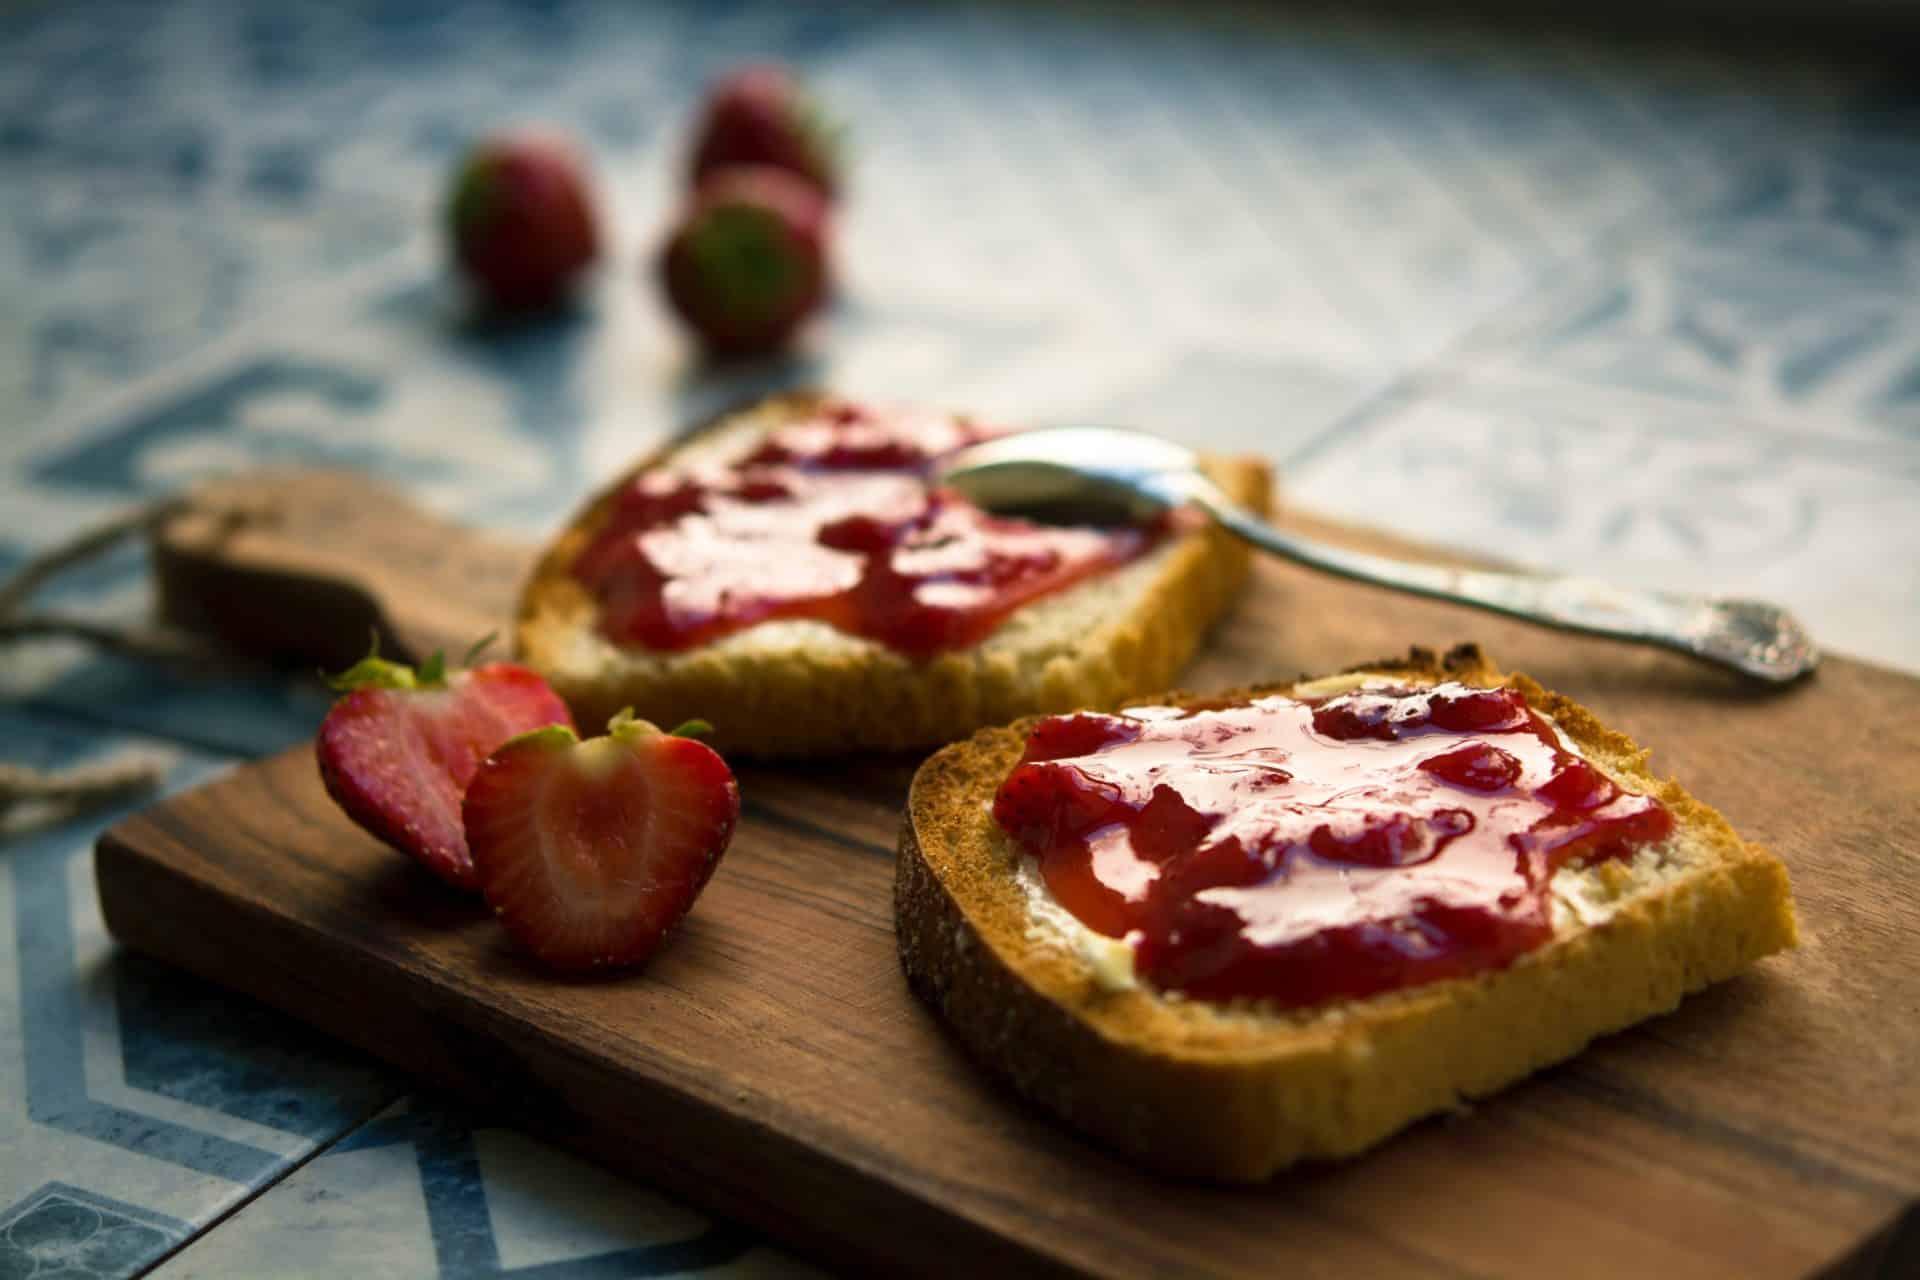 World's Best Homemade Strawberry Jam